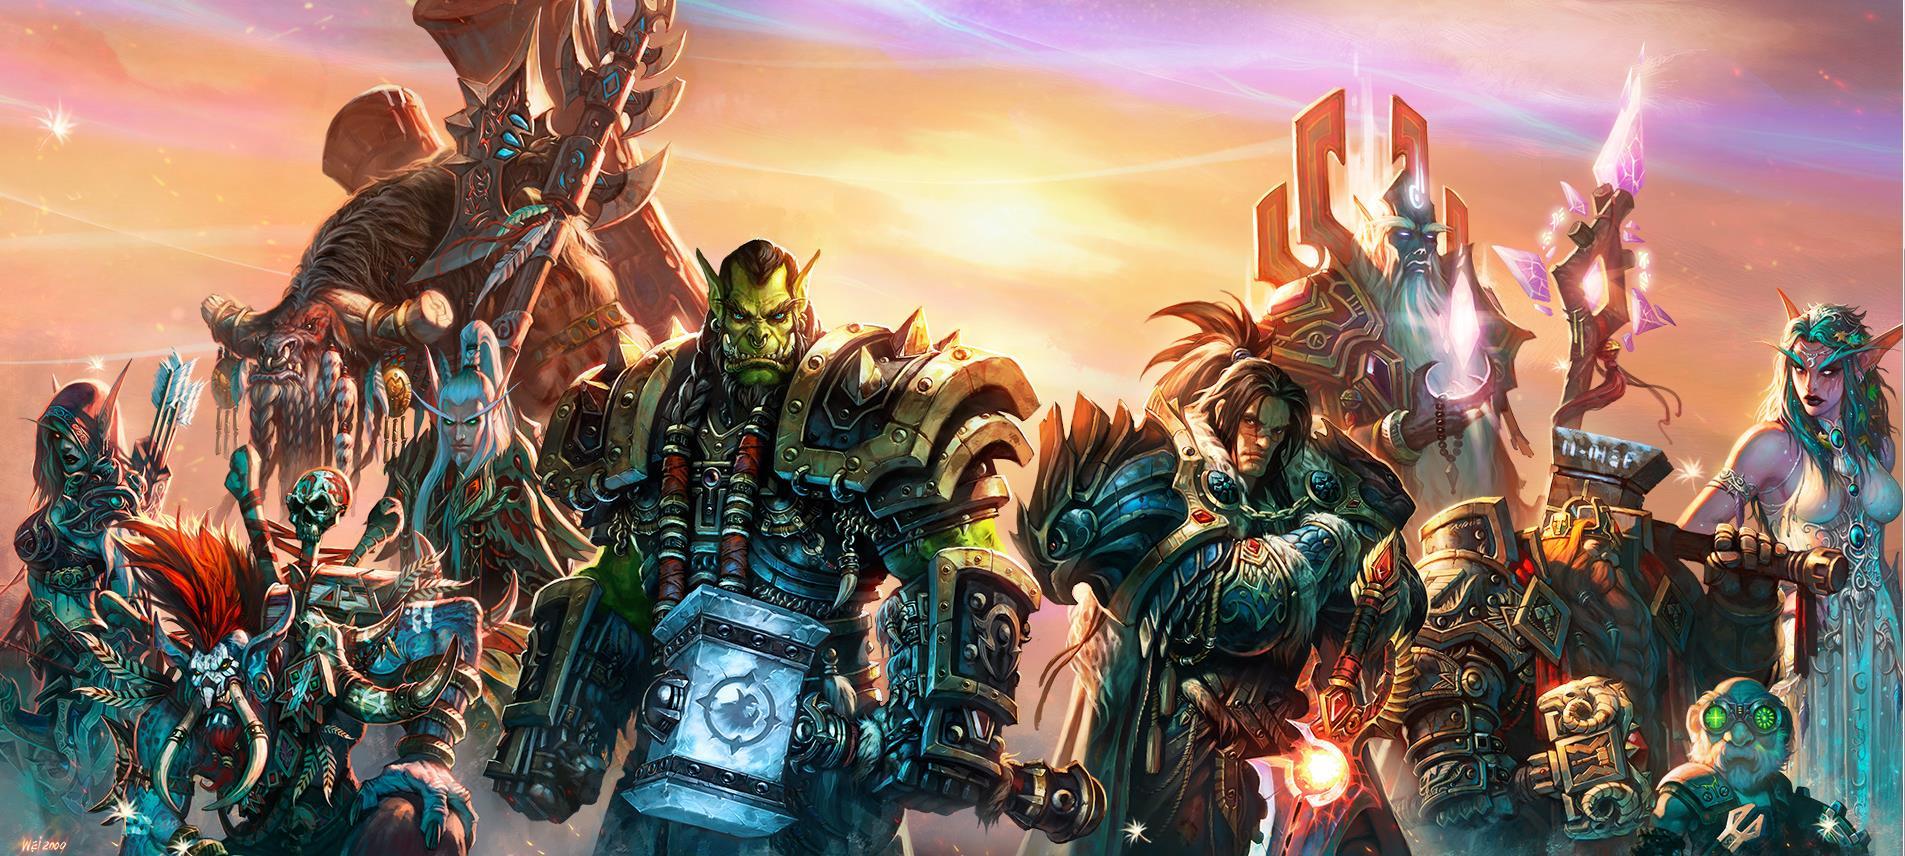 Warcraft Movie Artwork Official Cast Details Revealed Hype